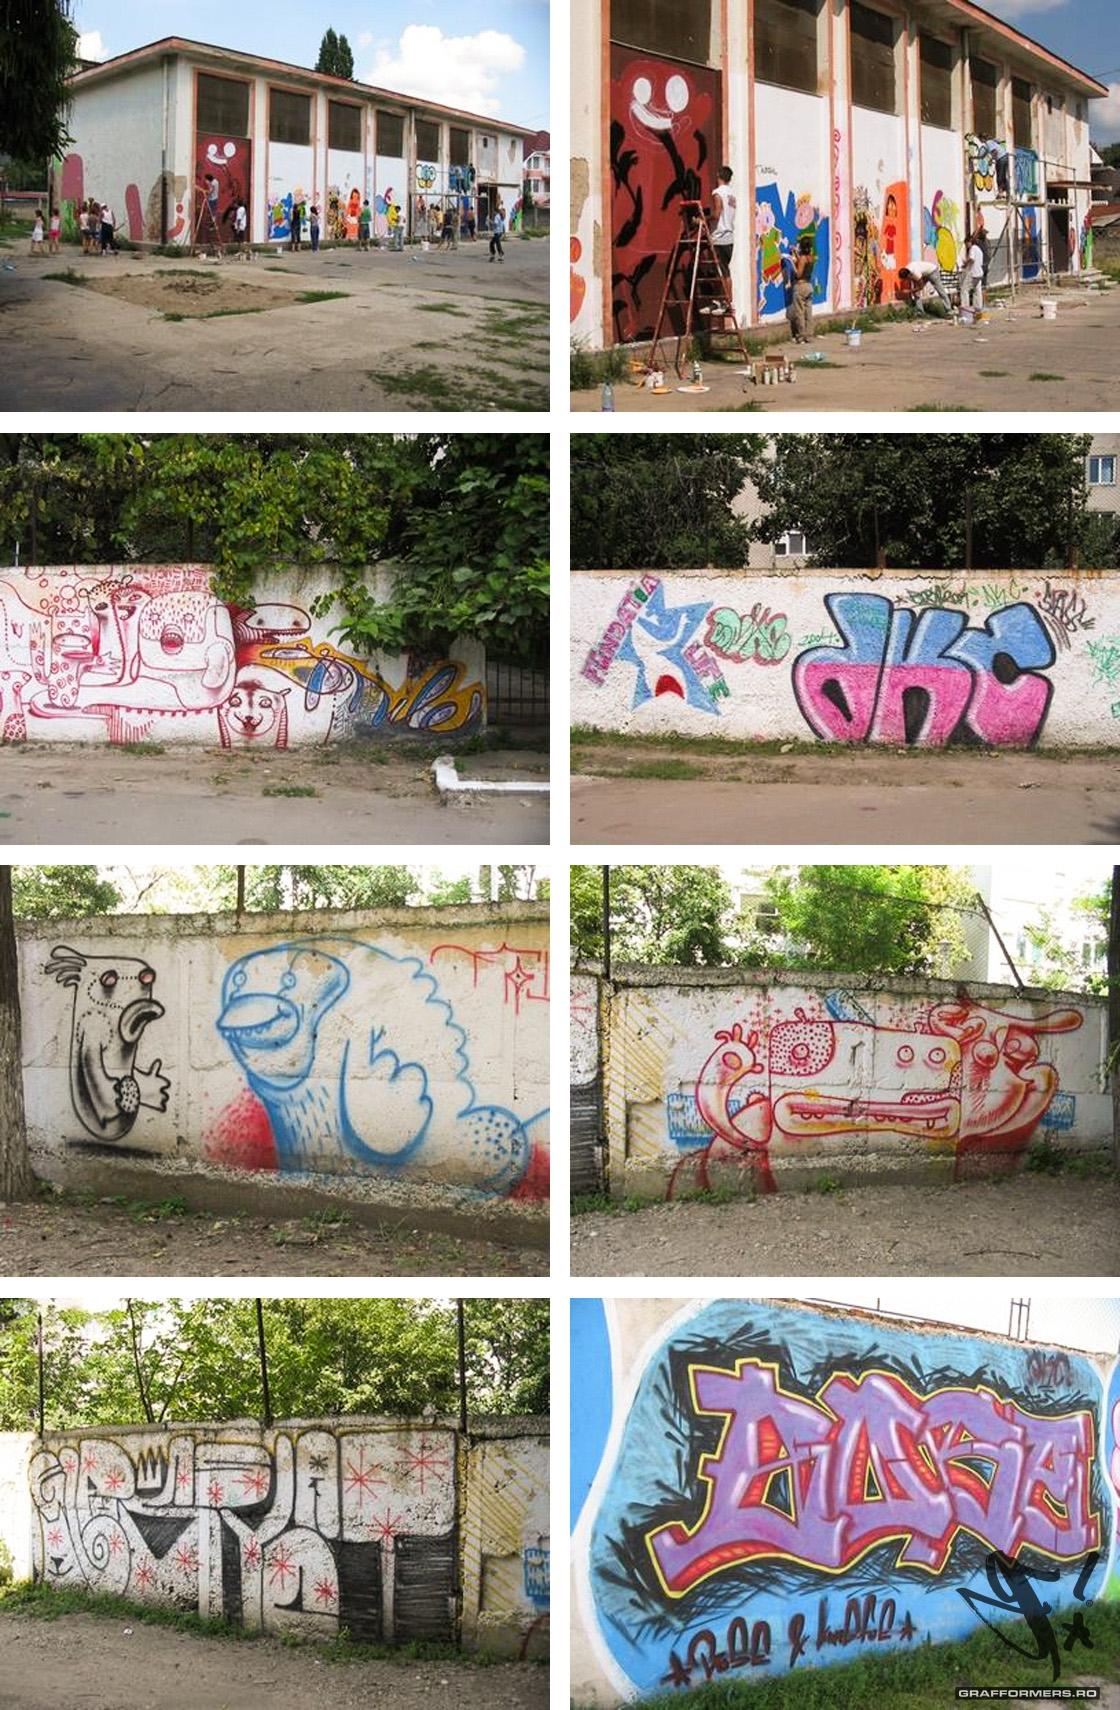 08-20040812-intercultural_communication_through_graffiti-oradea-grafformers_ro